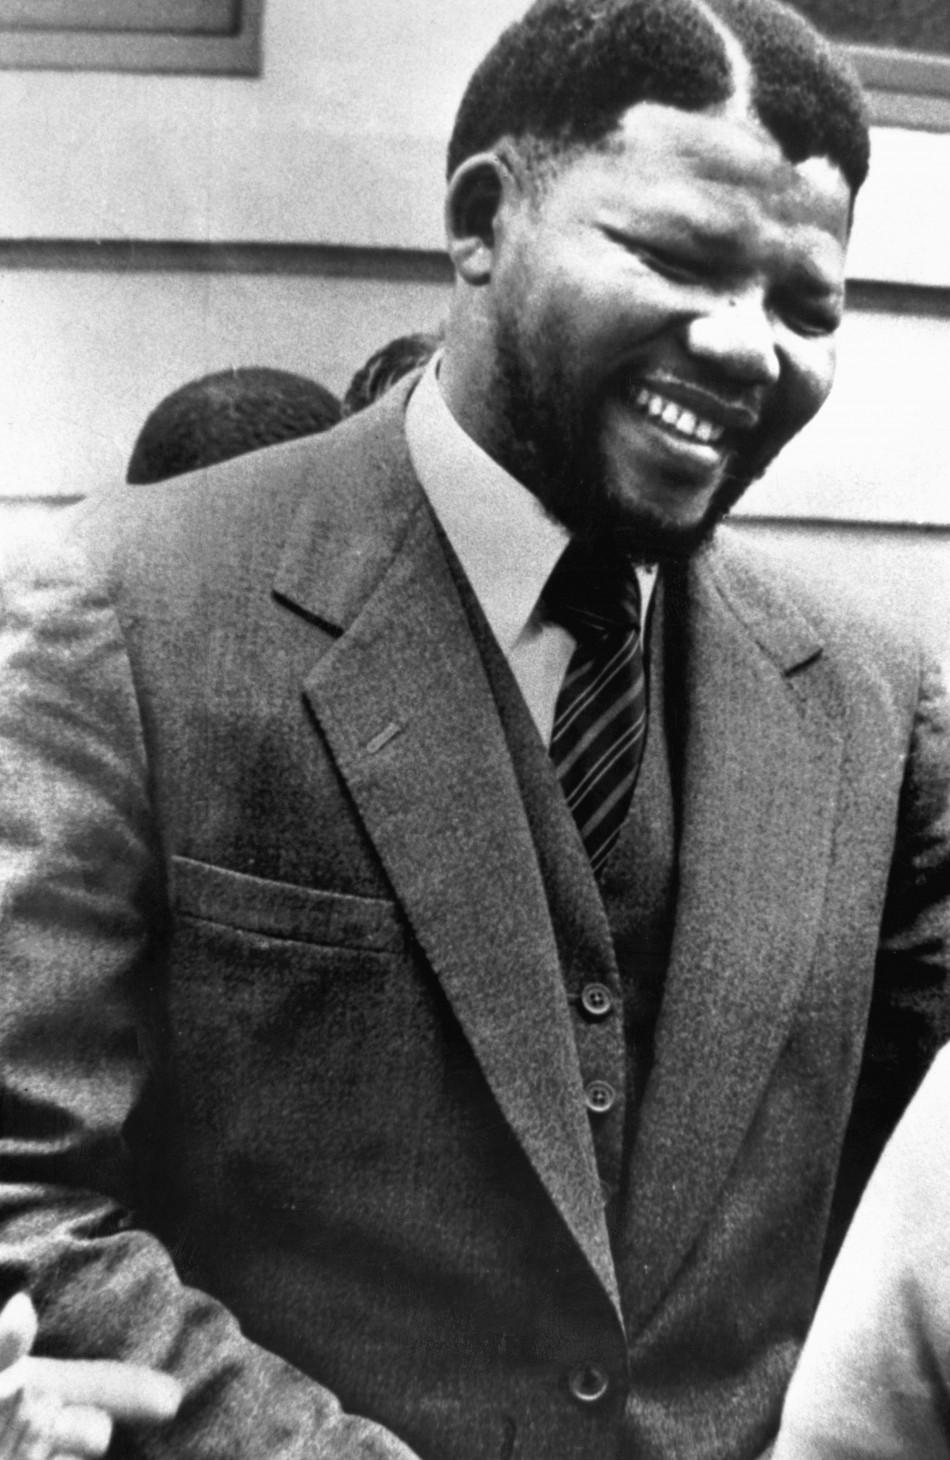 NELSON MANDELA, NOUL APARTHEID SI VECHII TICALOSI